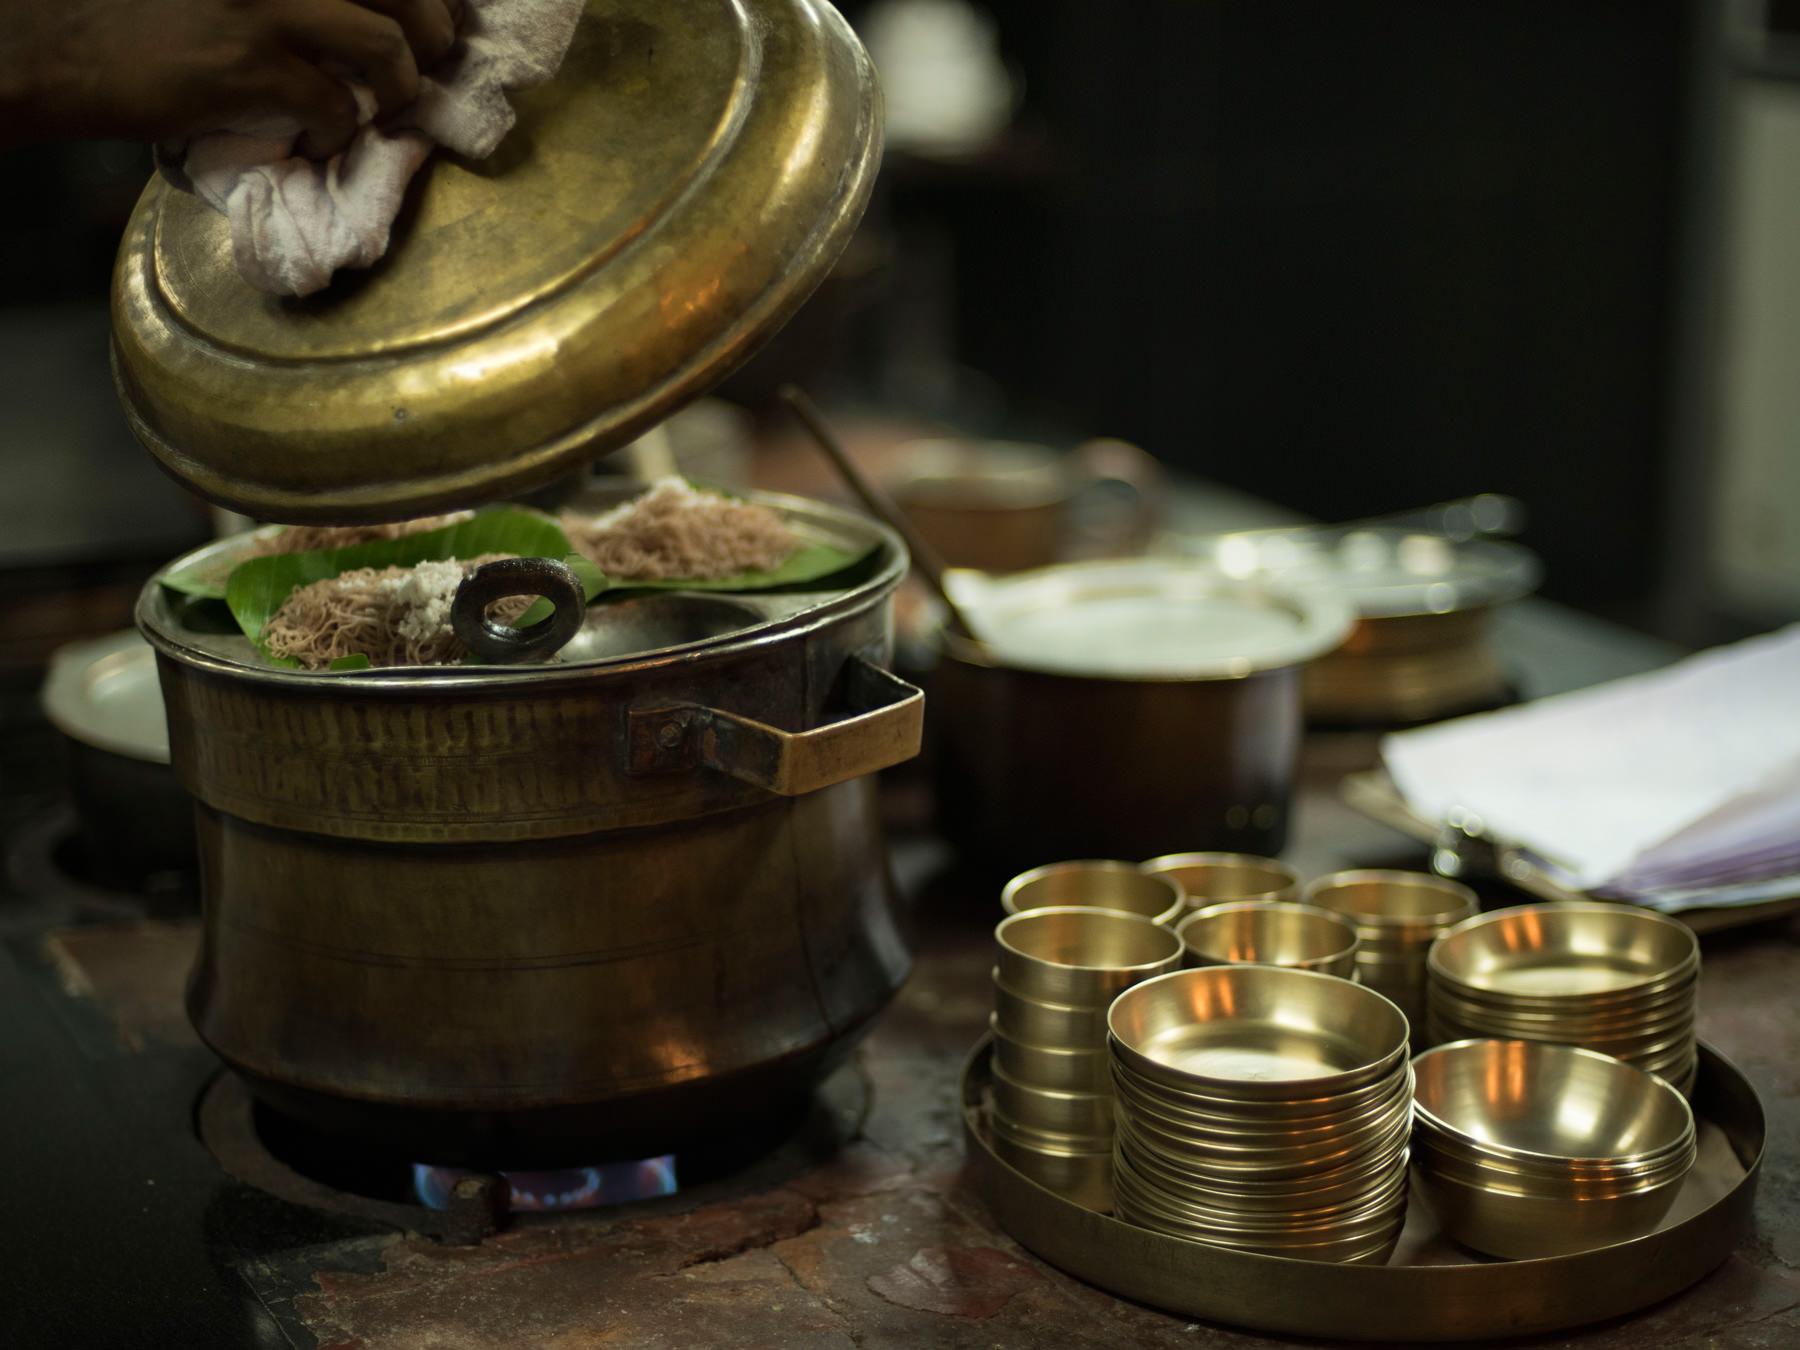 Food being cooked at a Panchakarma retreat.